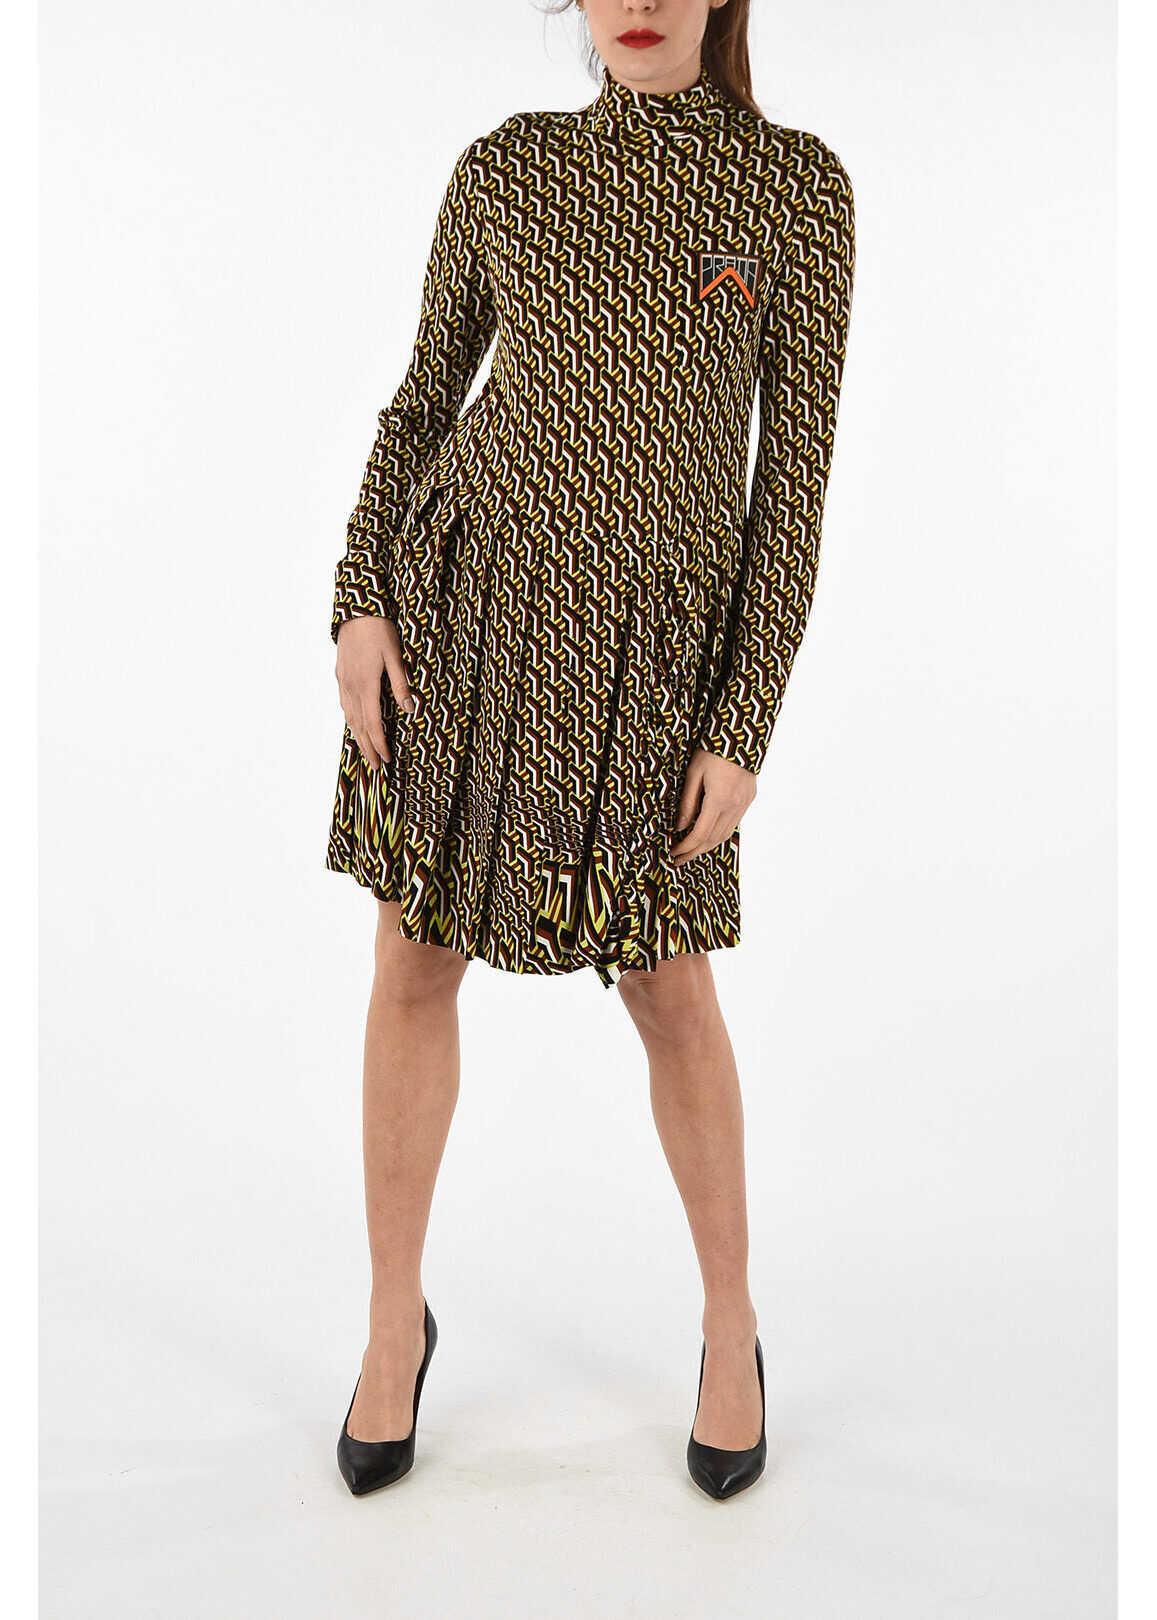 Prada Printed frilled dress MULTICOLOR